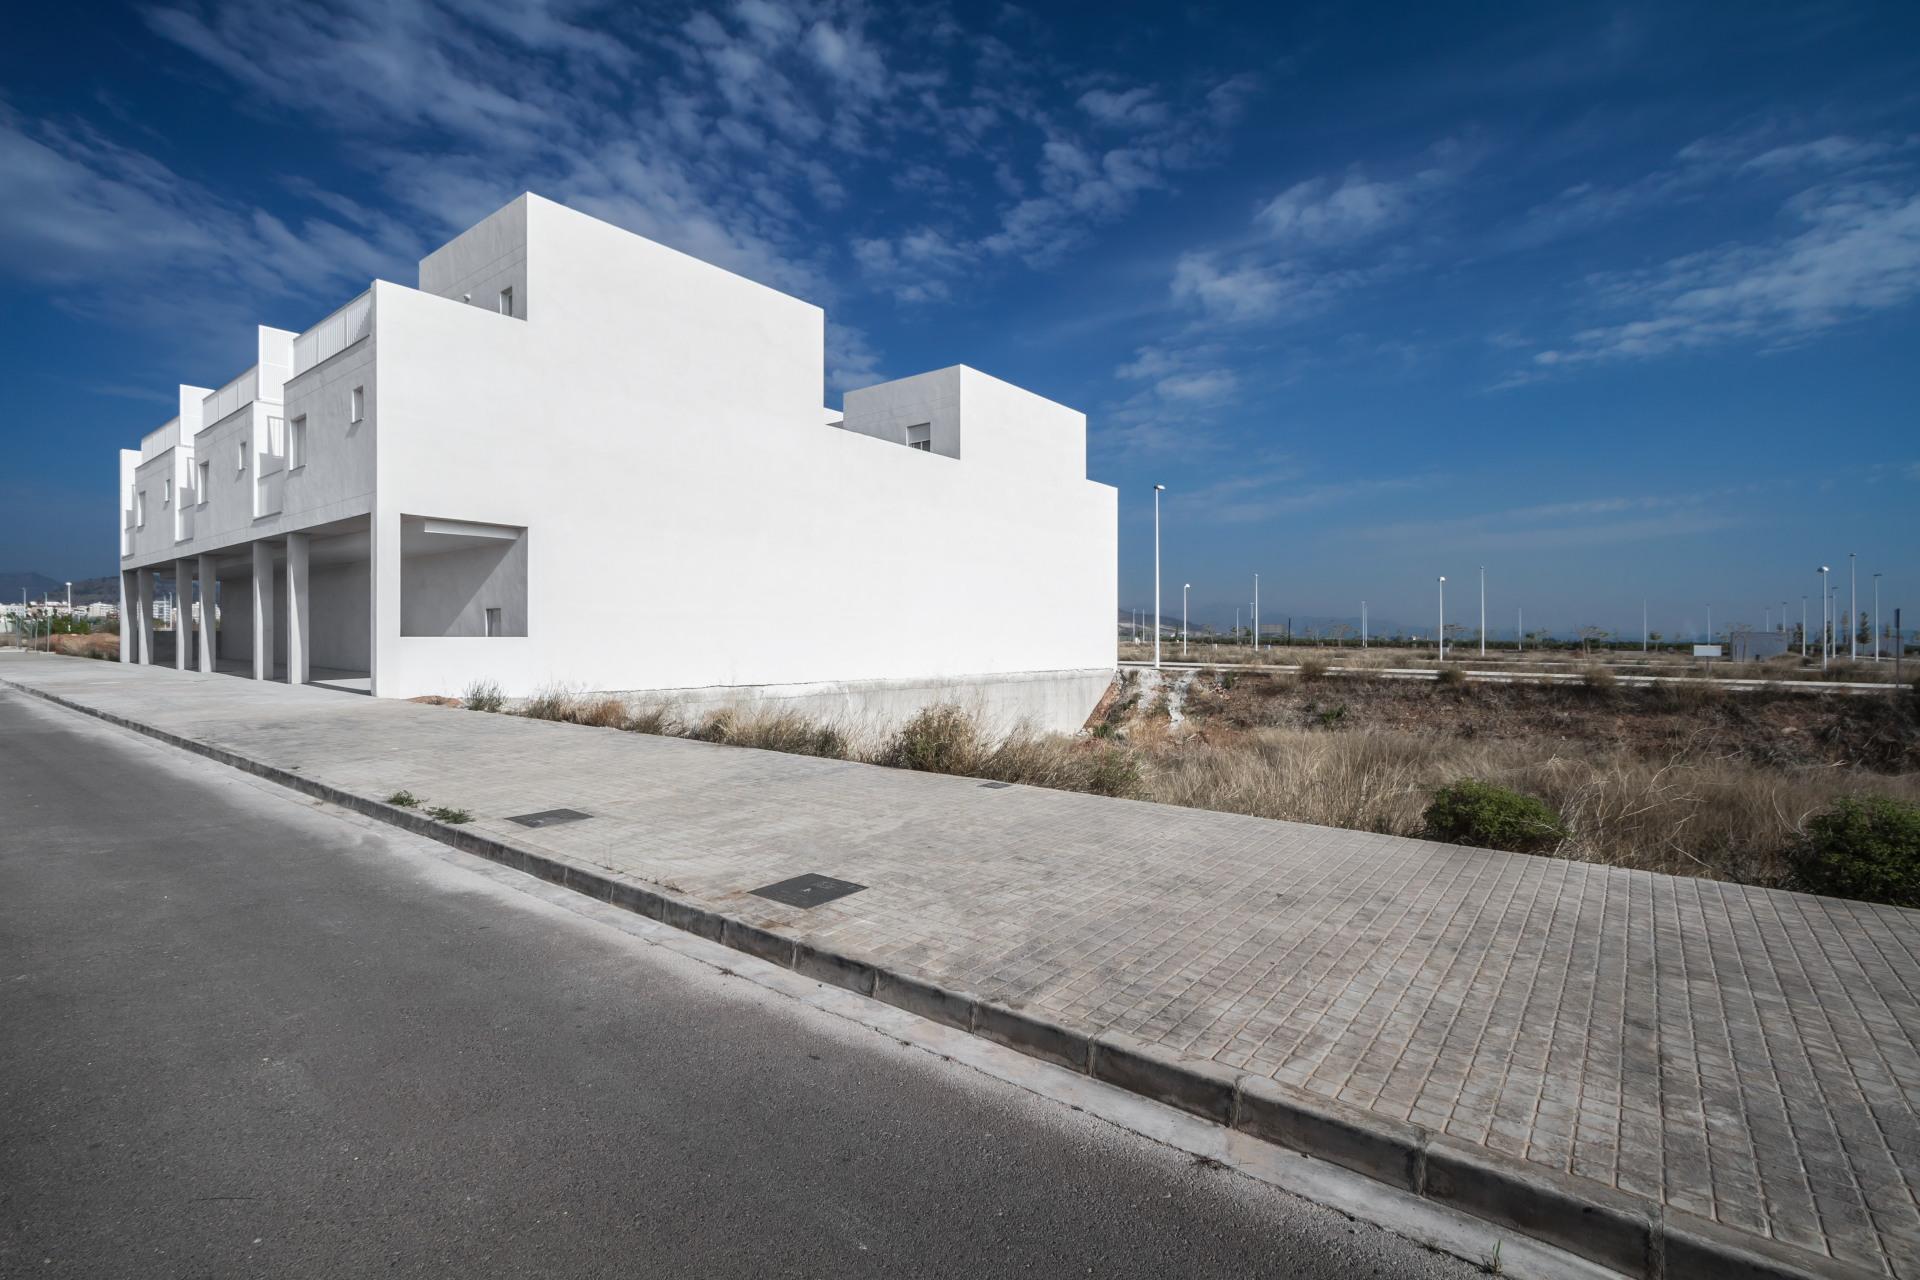 fotografia-arquitectura-valencia-german-cabo-viraje-sagunto (3)